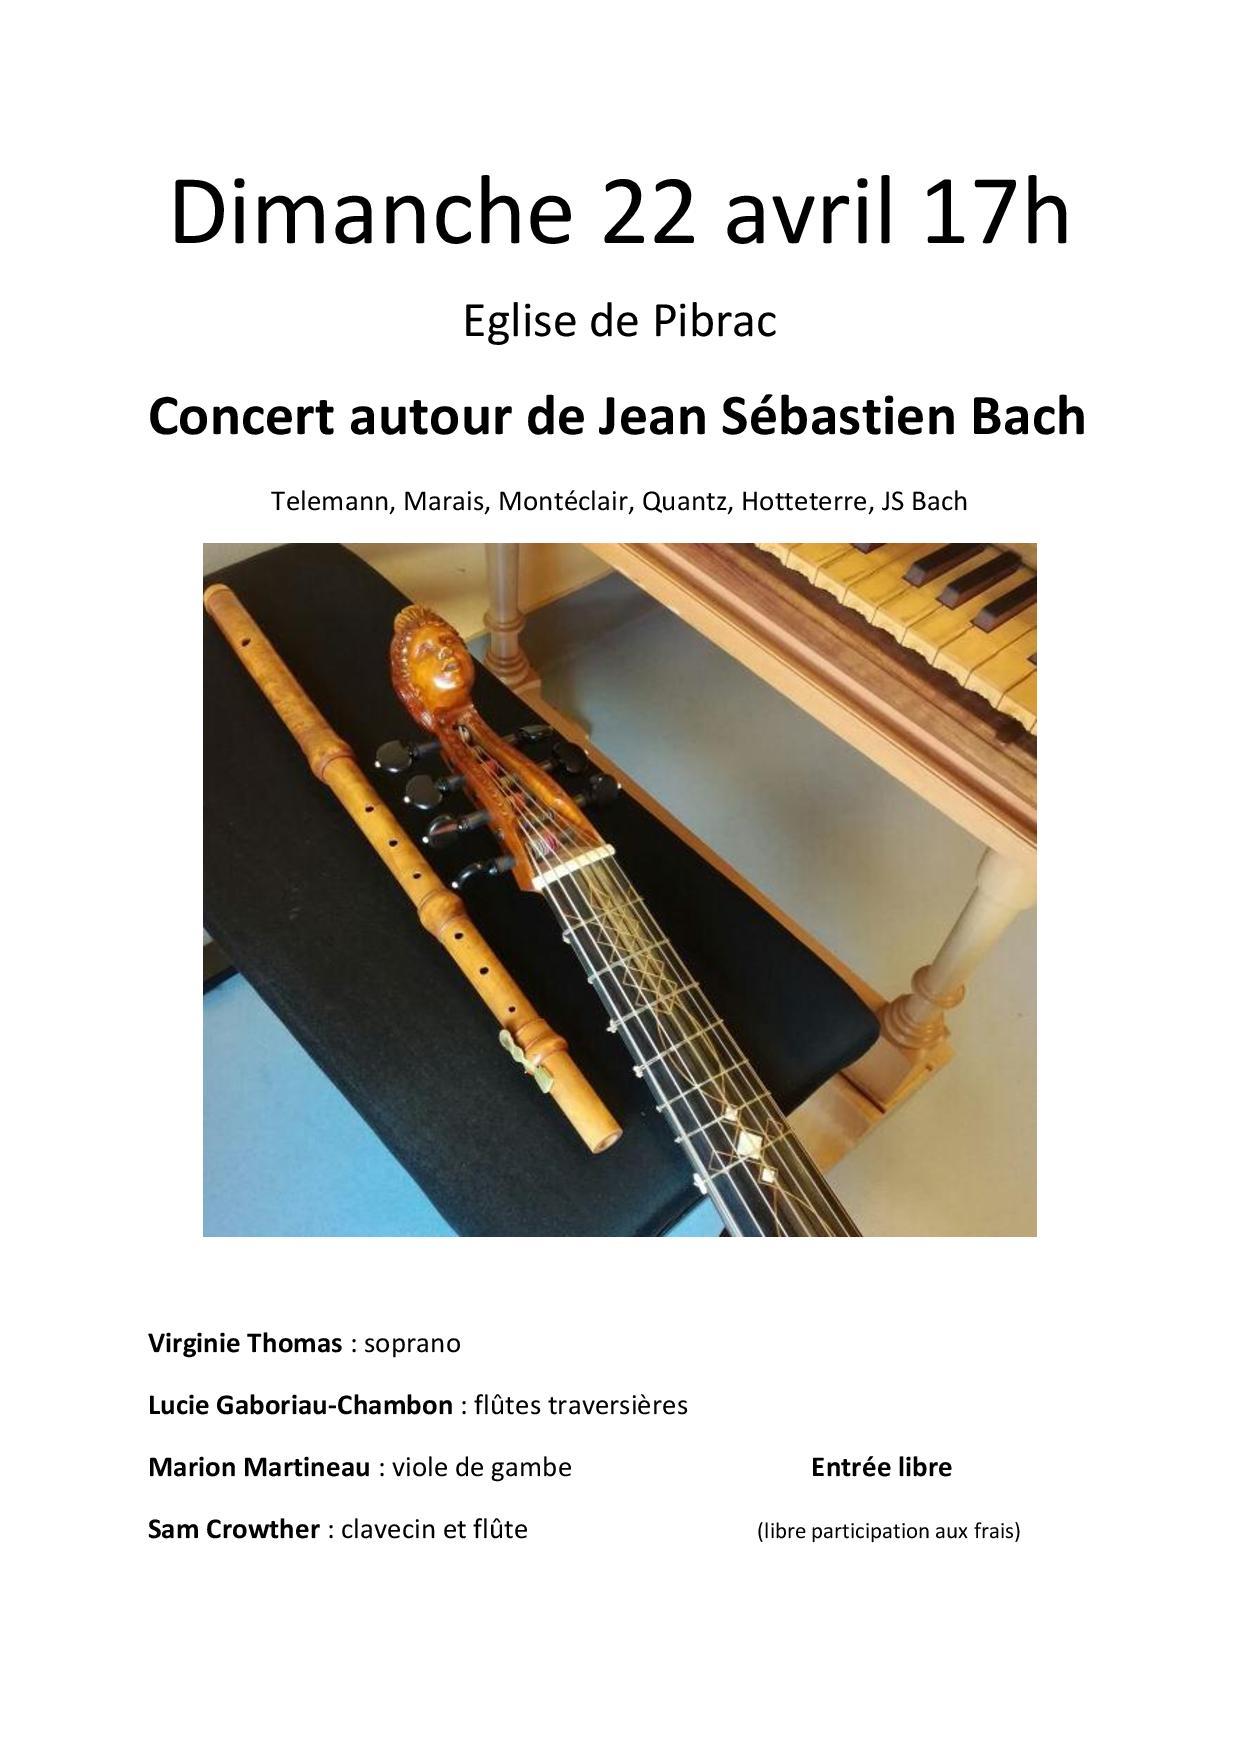 Concert 22 avril 2018